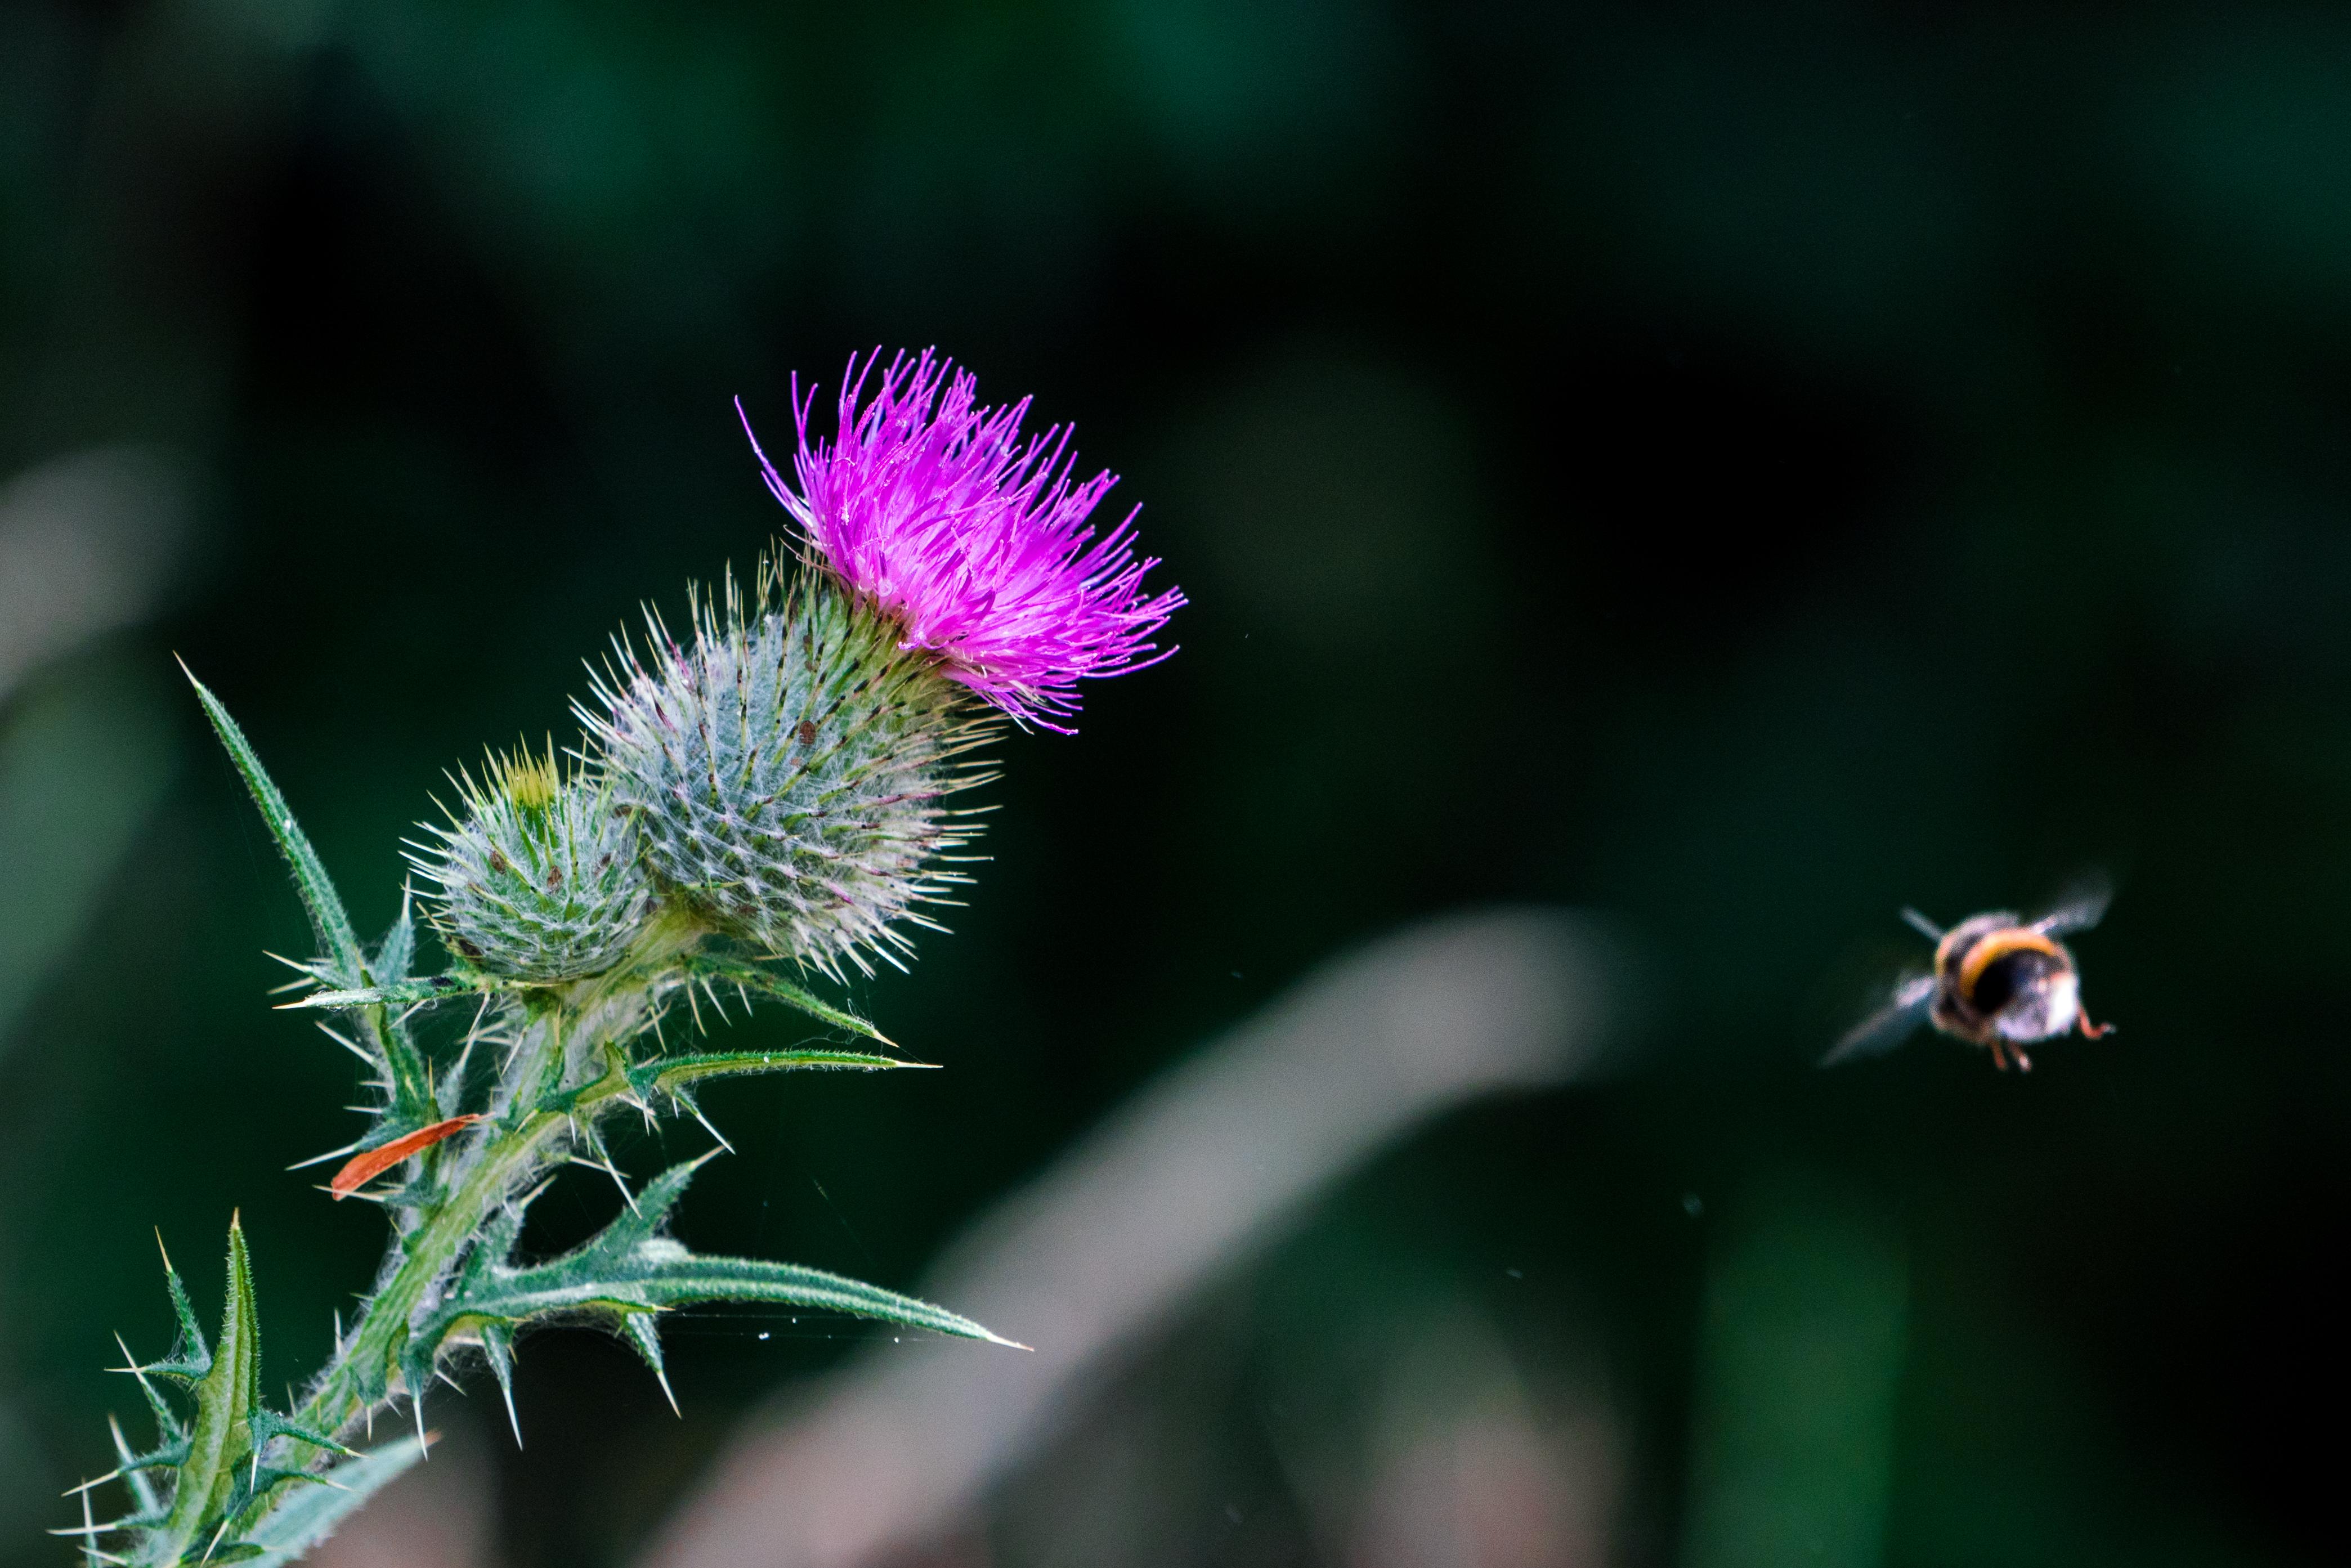 Inbound bee.